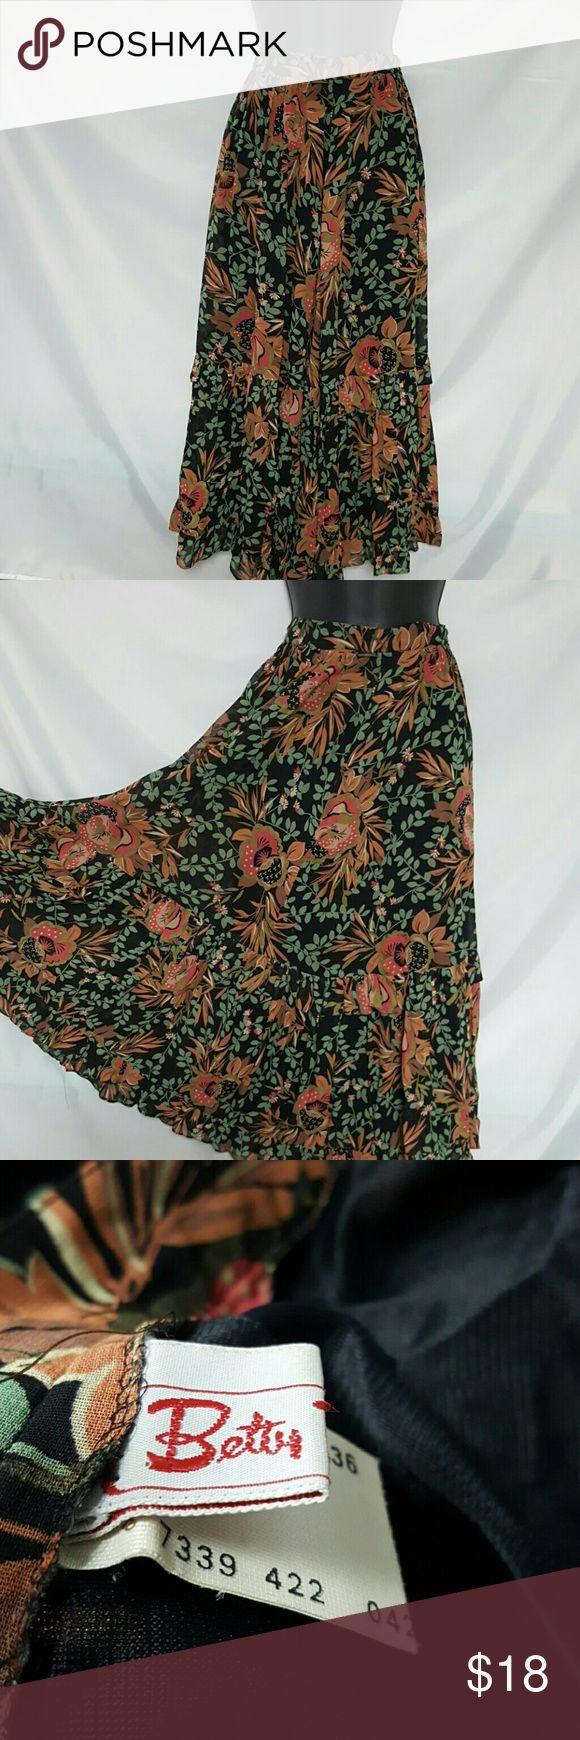 Selling this Vintage Betty barclay skirt on Poshmark! My username is: helenajacobs. #shopmycloset #poshmark #fashion #shopping #style #forsale #Betty barclay  #Dresses & Skirts